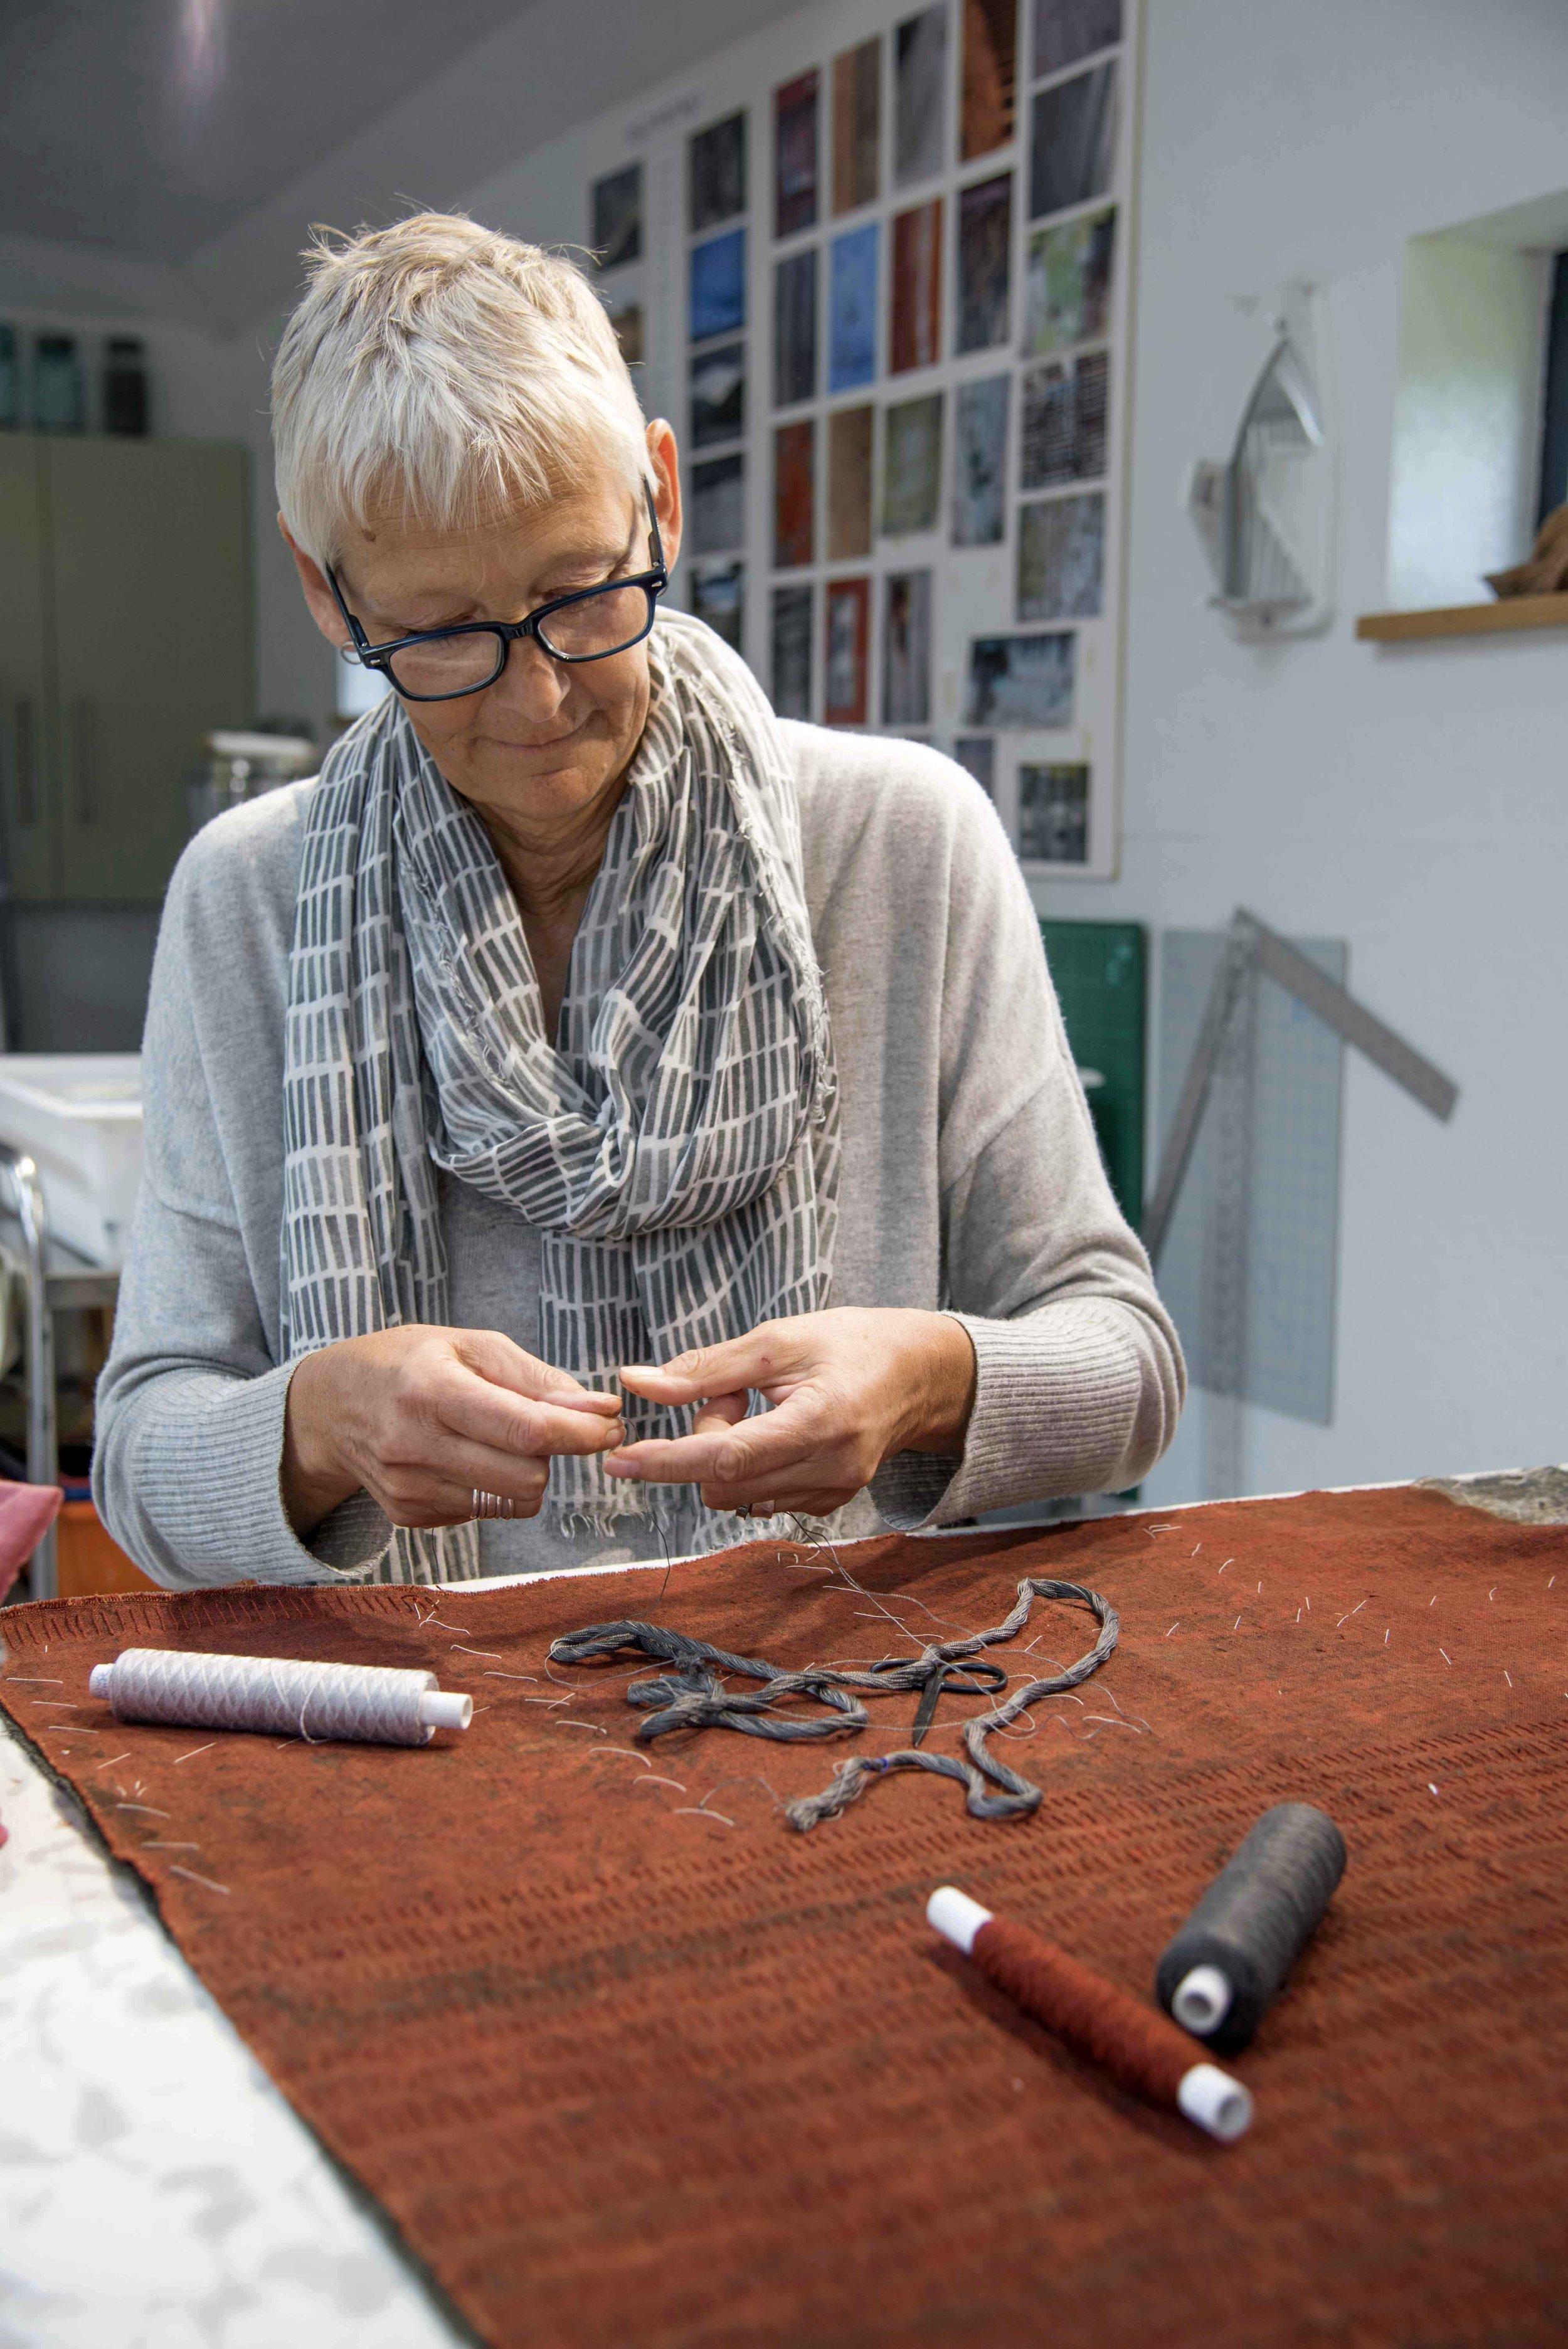 Claire Benn at work